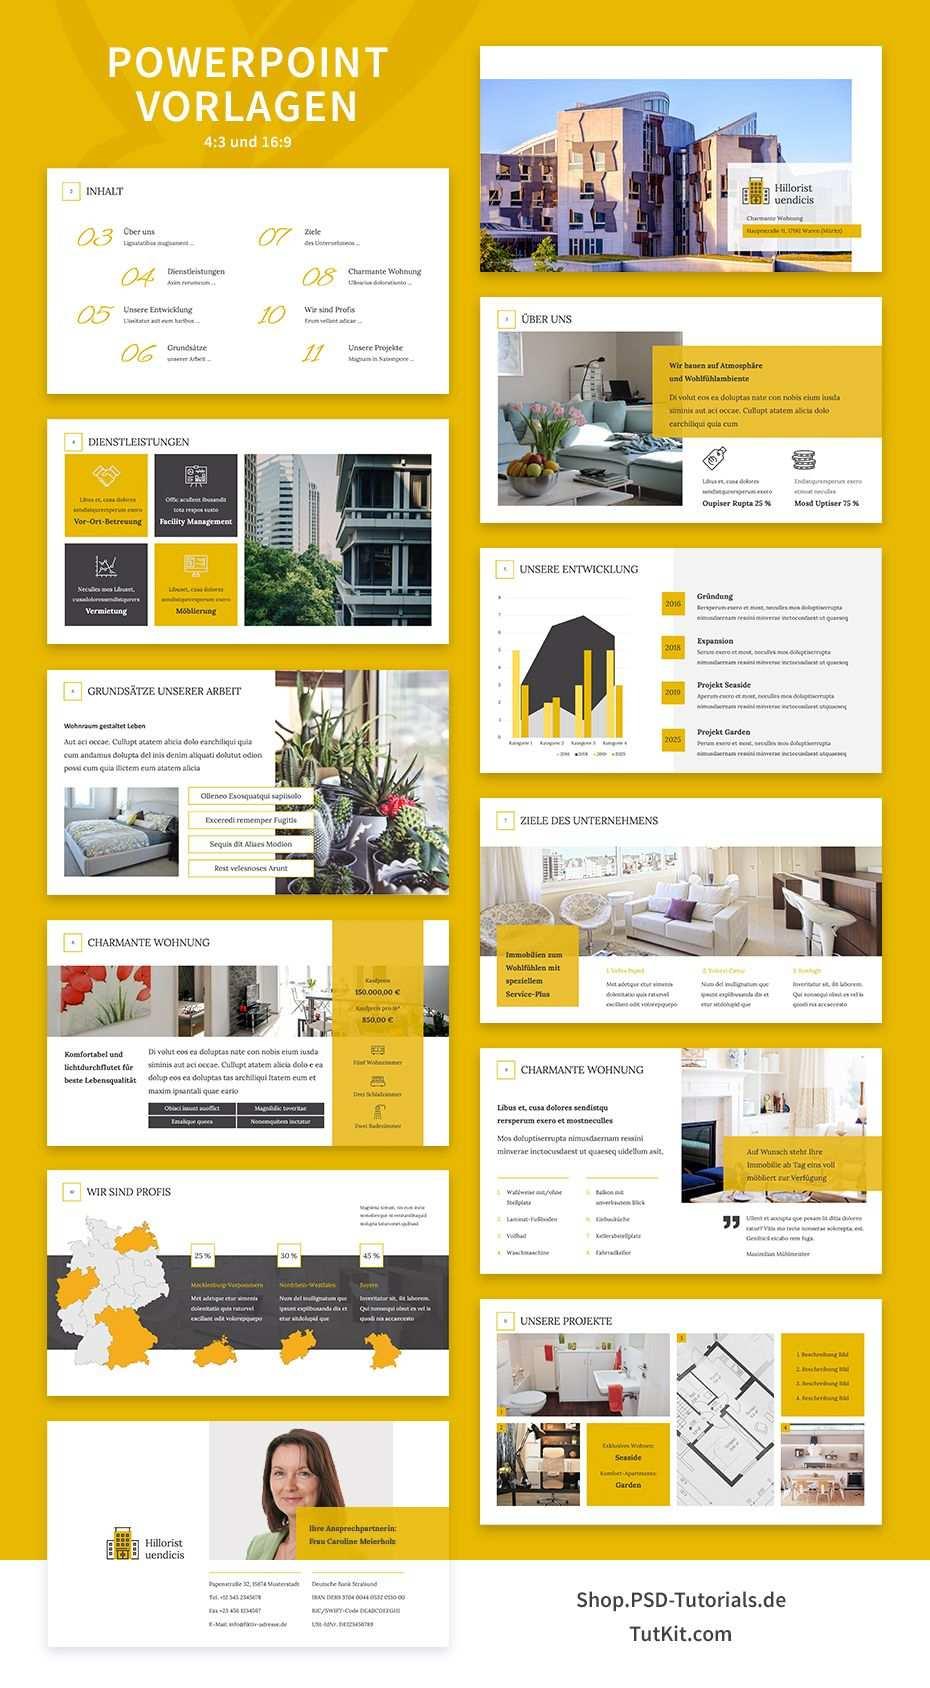 Immobilien Marketing Hochwertige Corporate Design Vorlagen Corporate Design Designvorlagen Expose Immobilien